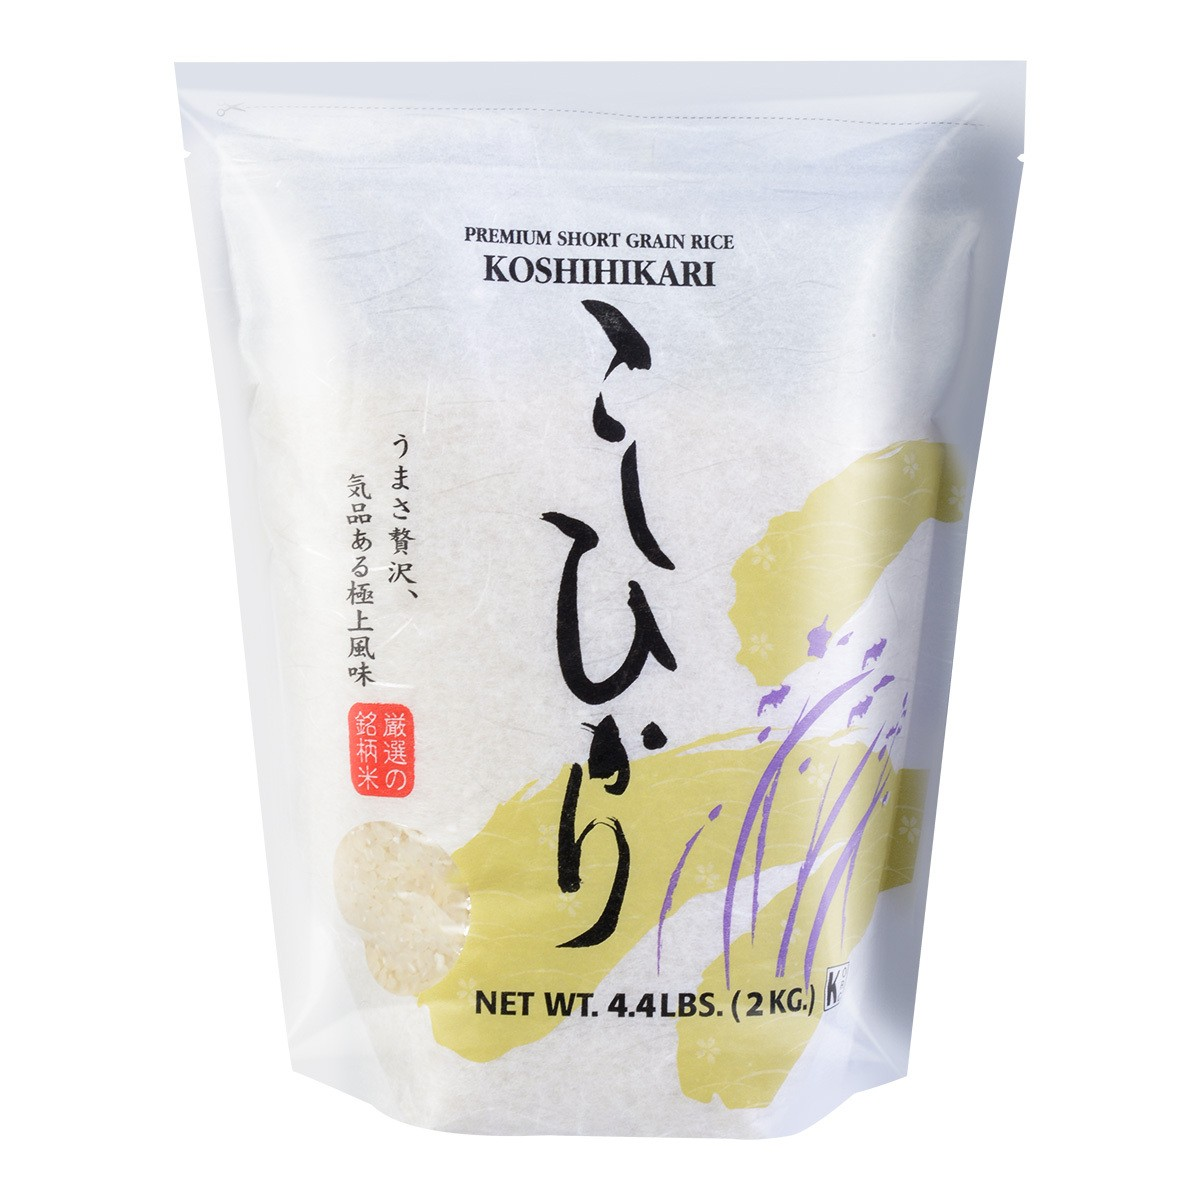 日本KOSHIHIKARI 高级短谷米 2kg